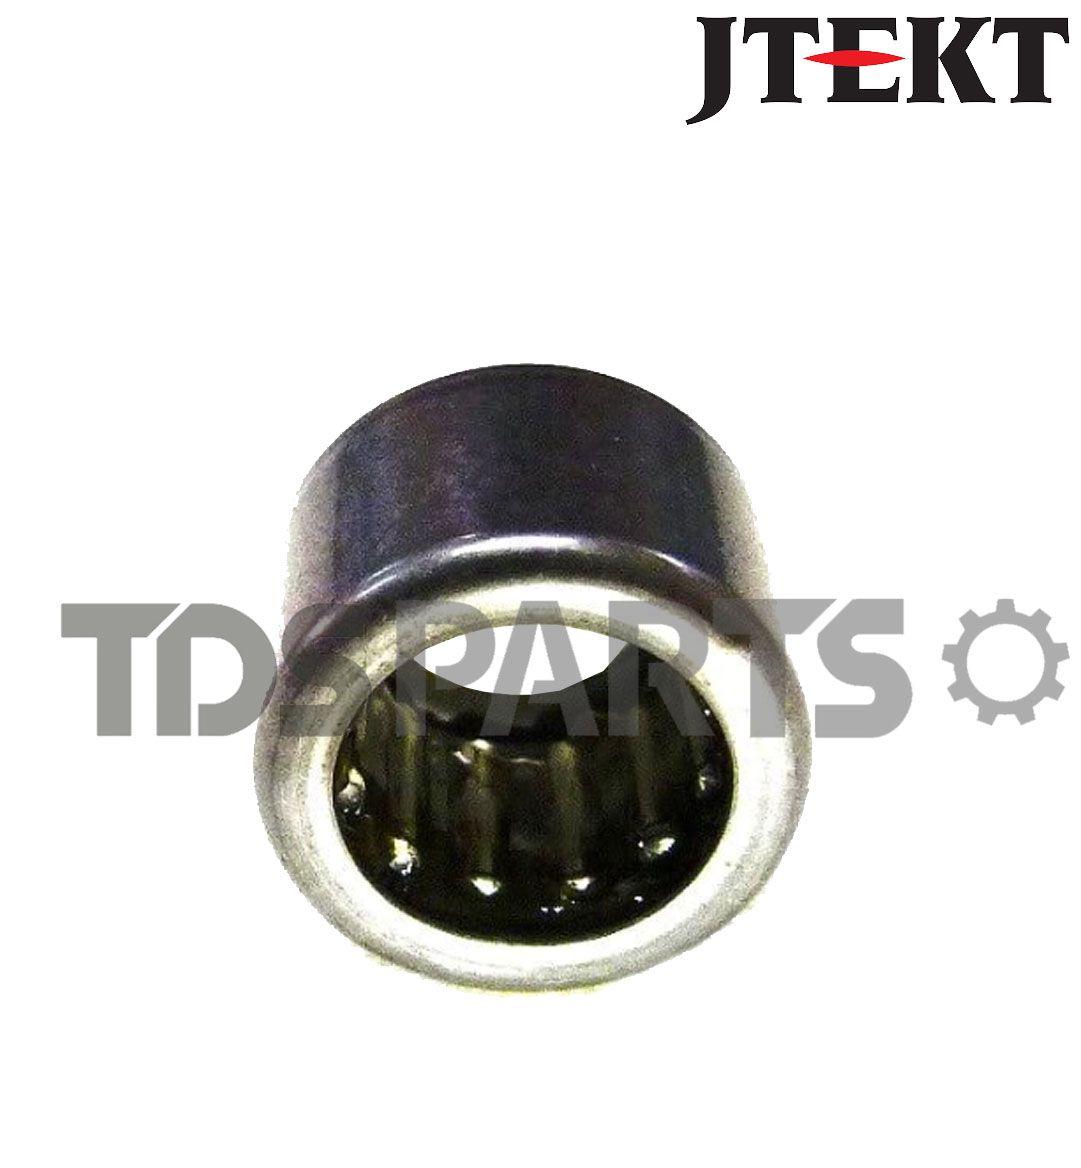 Kit Rolamento Inferior Pinhão Caixa Jtekt Gol | Fox | Polo | Scenic | Clio | Peugeot